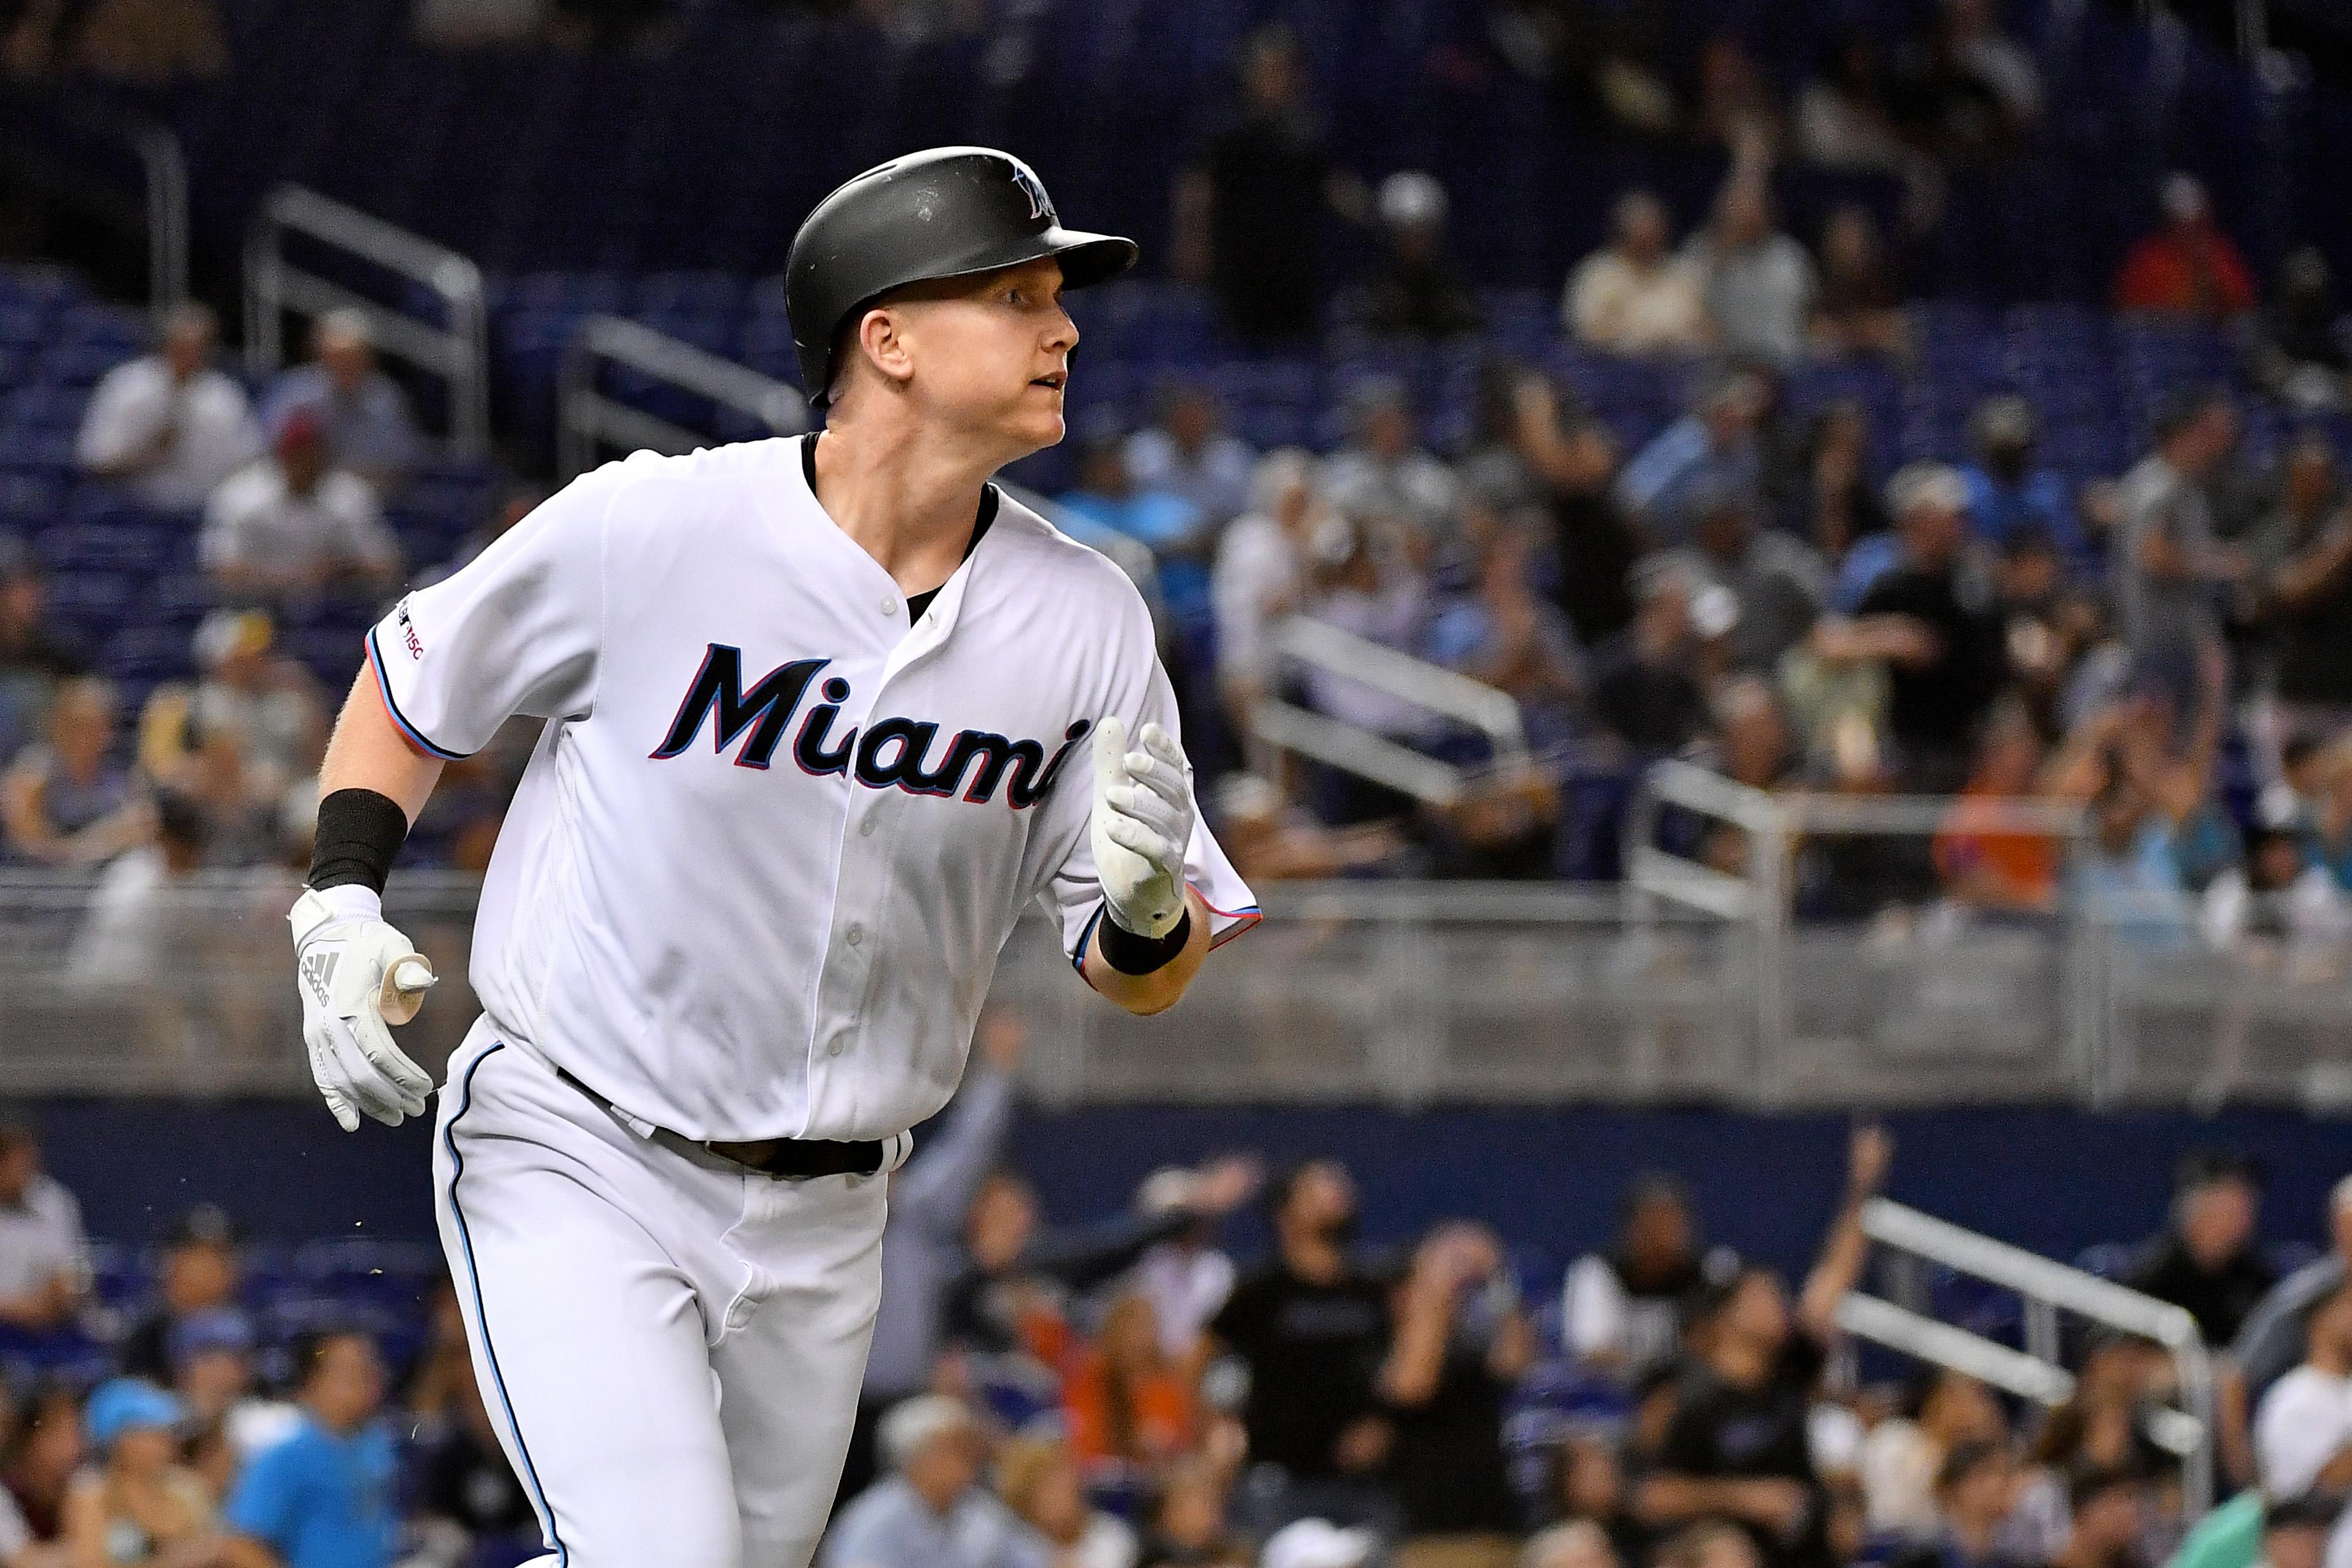 MLB readjusts schedule after Marlins coronavirus outbreak